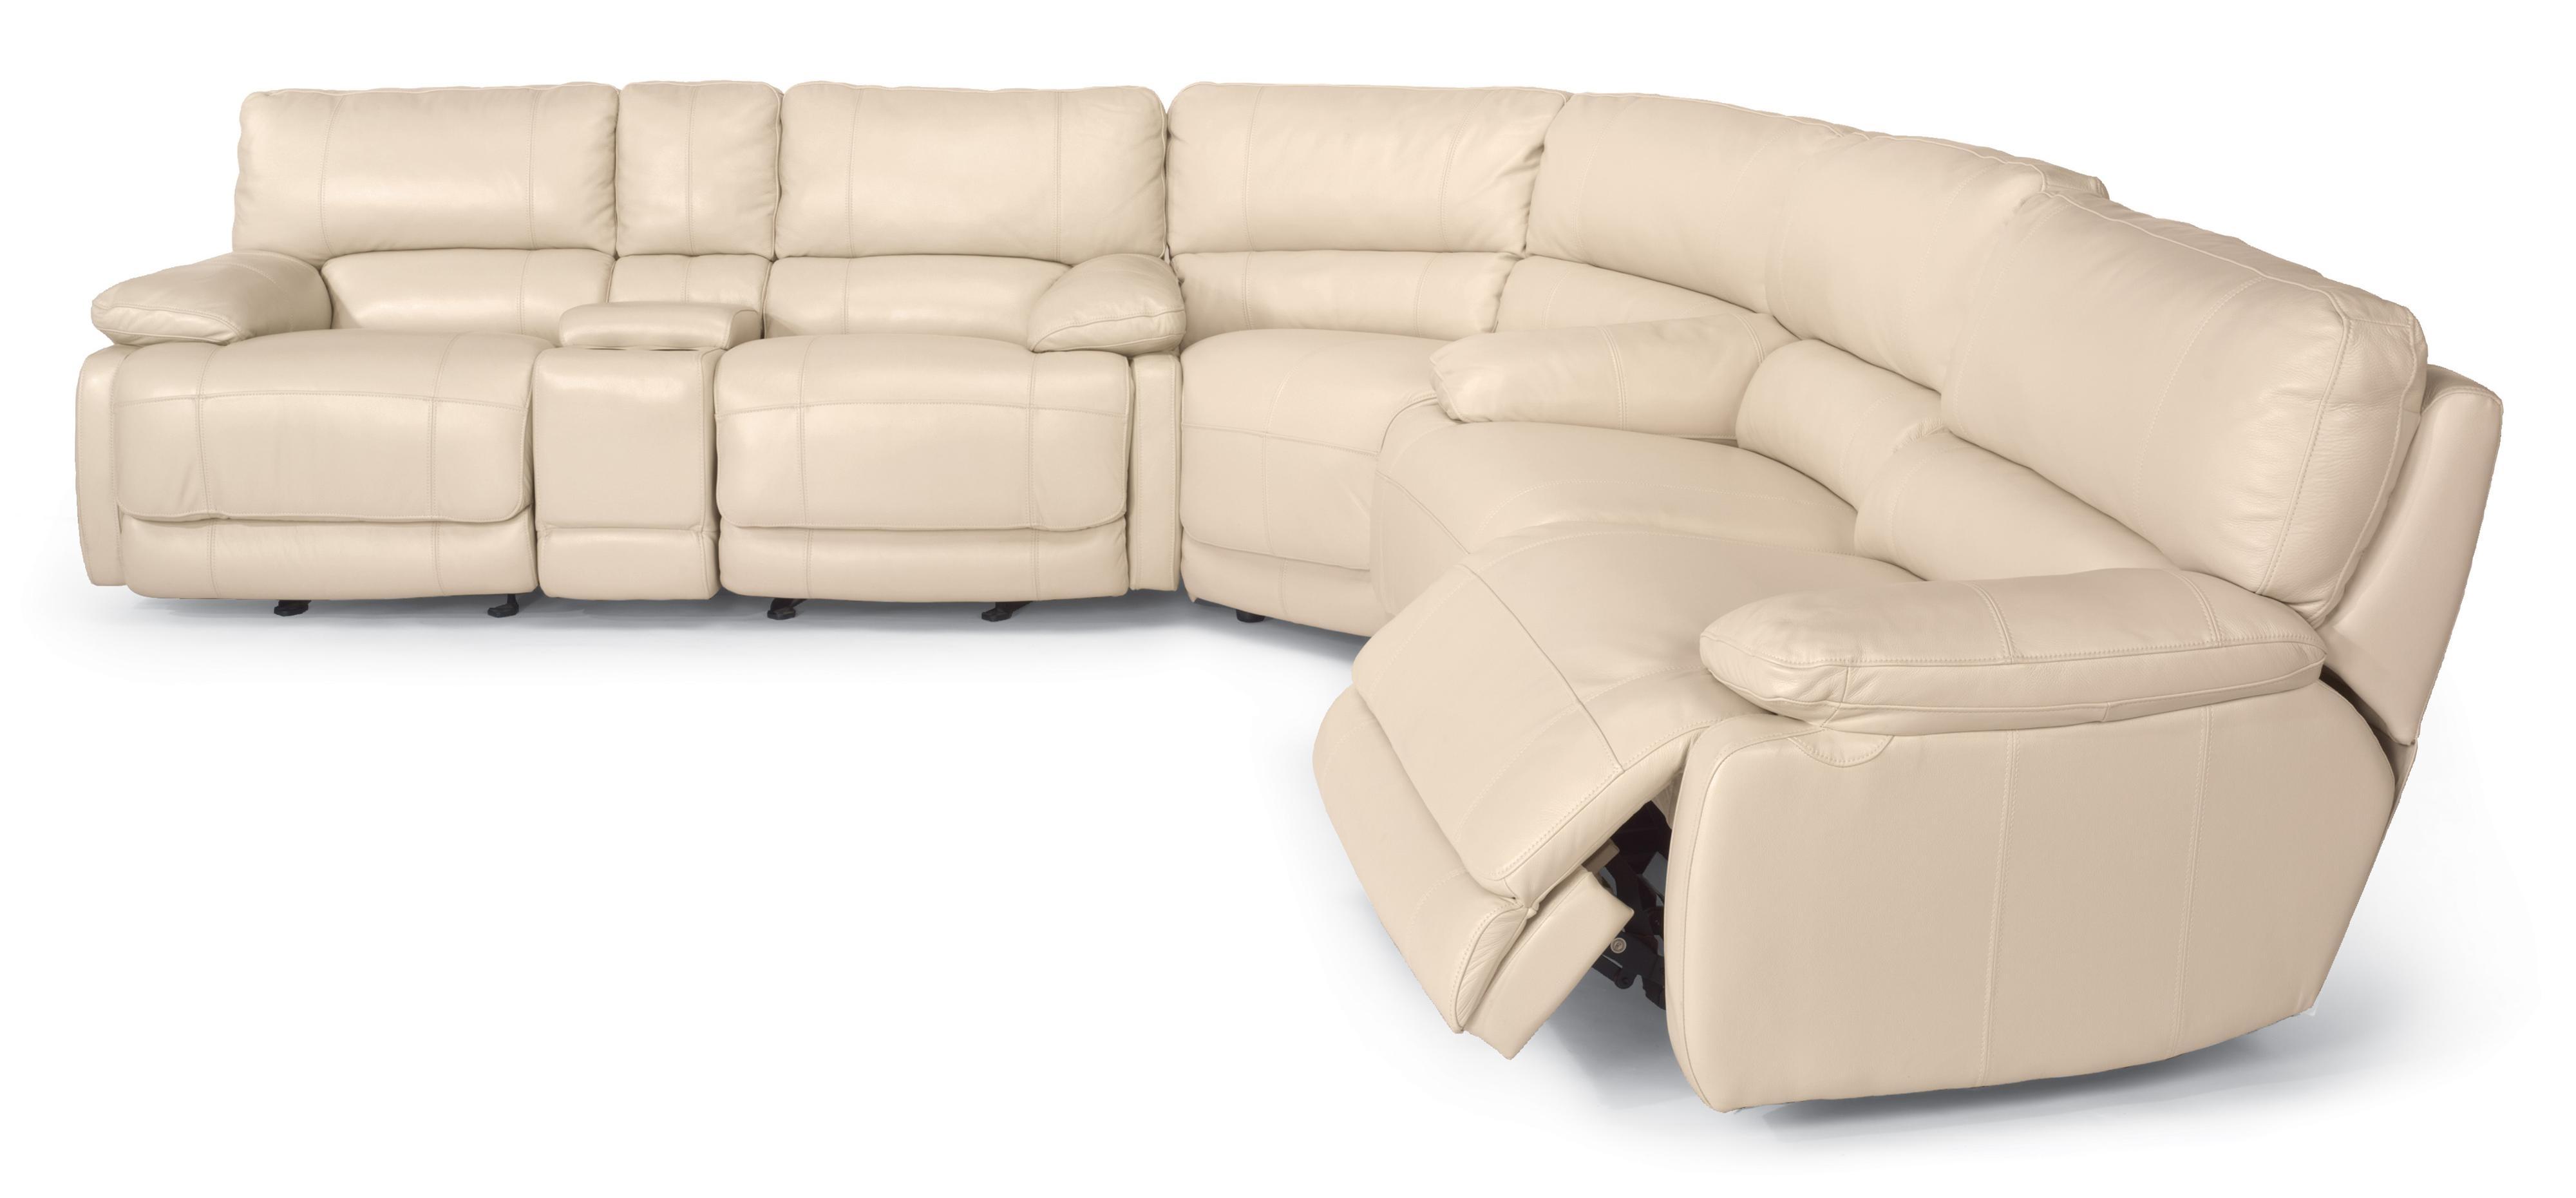 Kansas City Mo Sectional Sofas Within Favorite Flexsteel Latitudes – Hermosa Reclining Sectional Sofa – Ahfa (View 8 of 15)